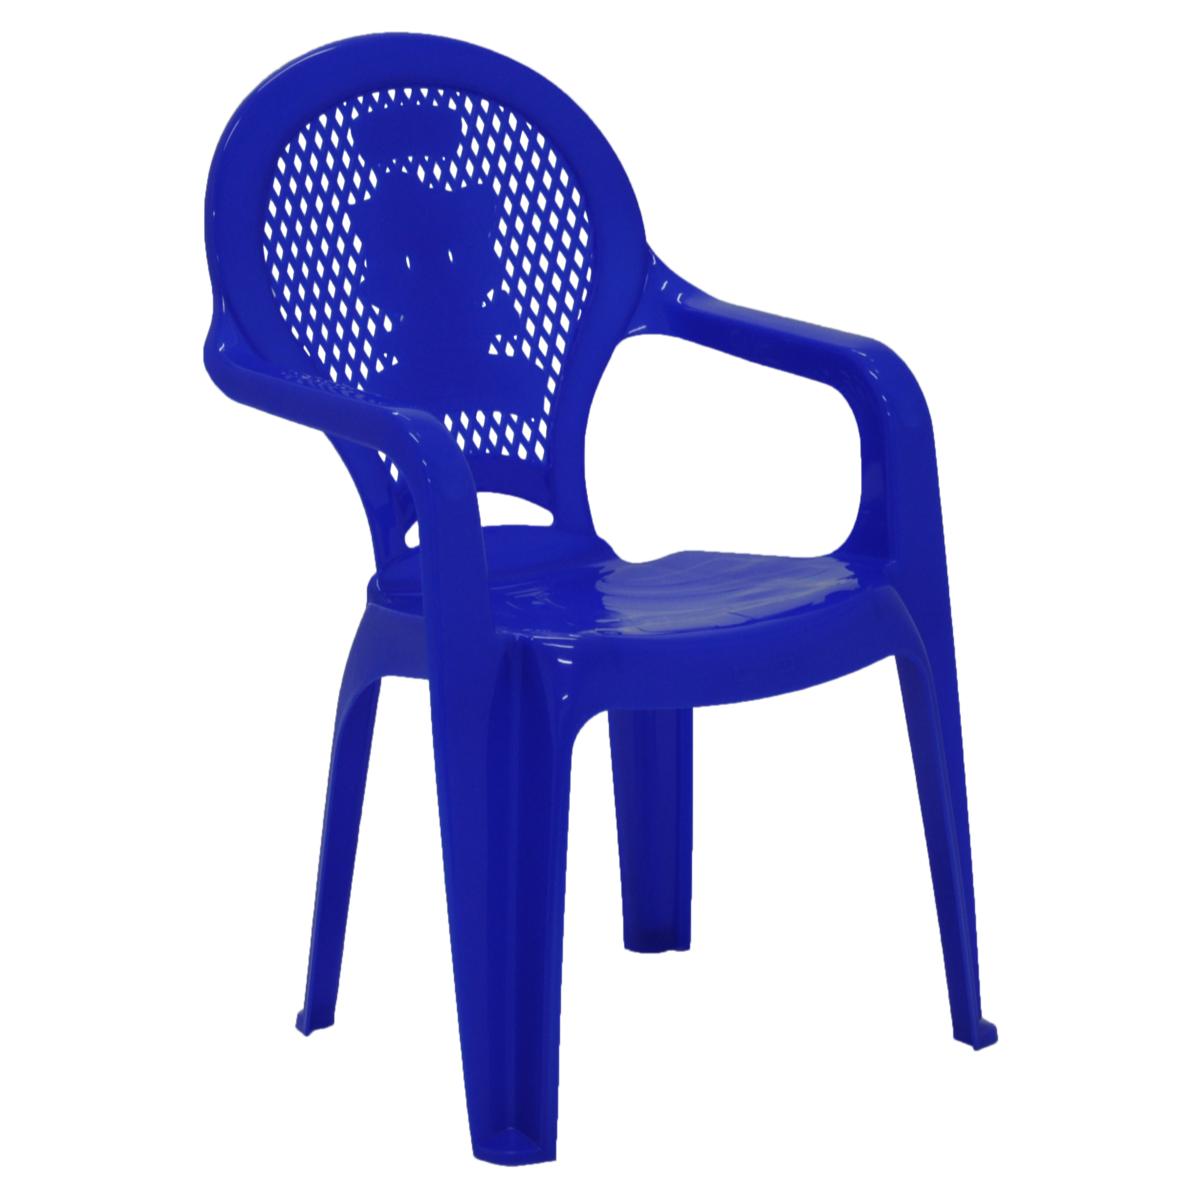 Poltrona Infantil de Plastico Estampada Azul 92264070 - Tramontina